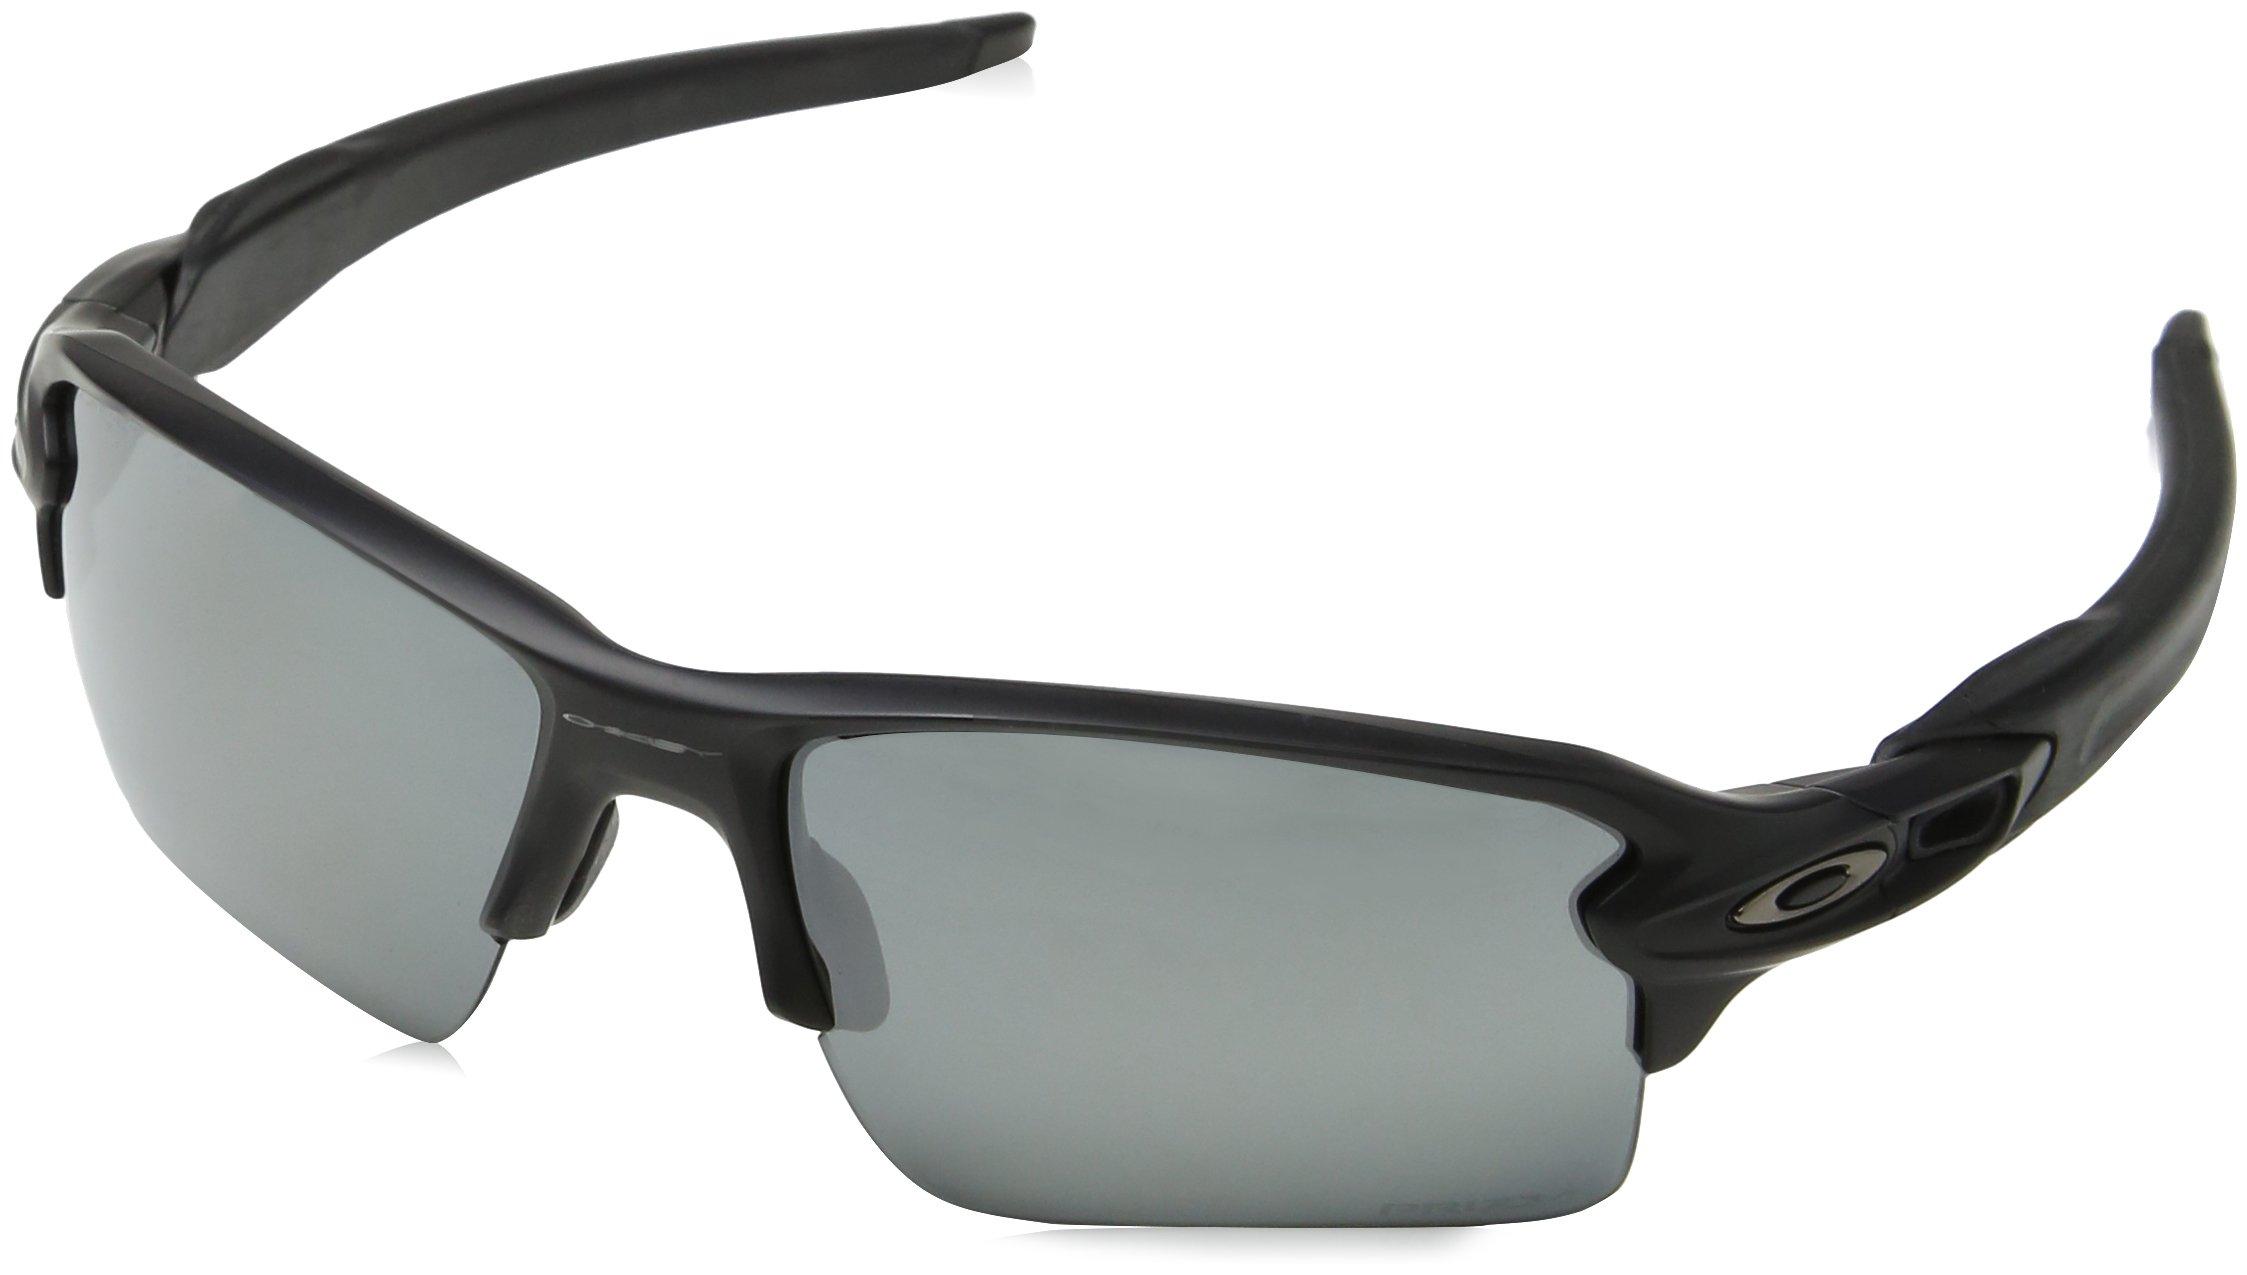 85366eff43 Oakley Men s OO9188 Flak 2.0 XL Sunglasses.  163.00. lensColor. Prizm  Black. color. Matte Black